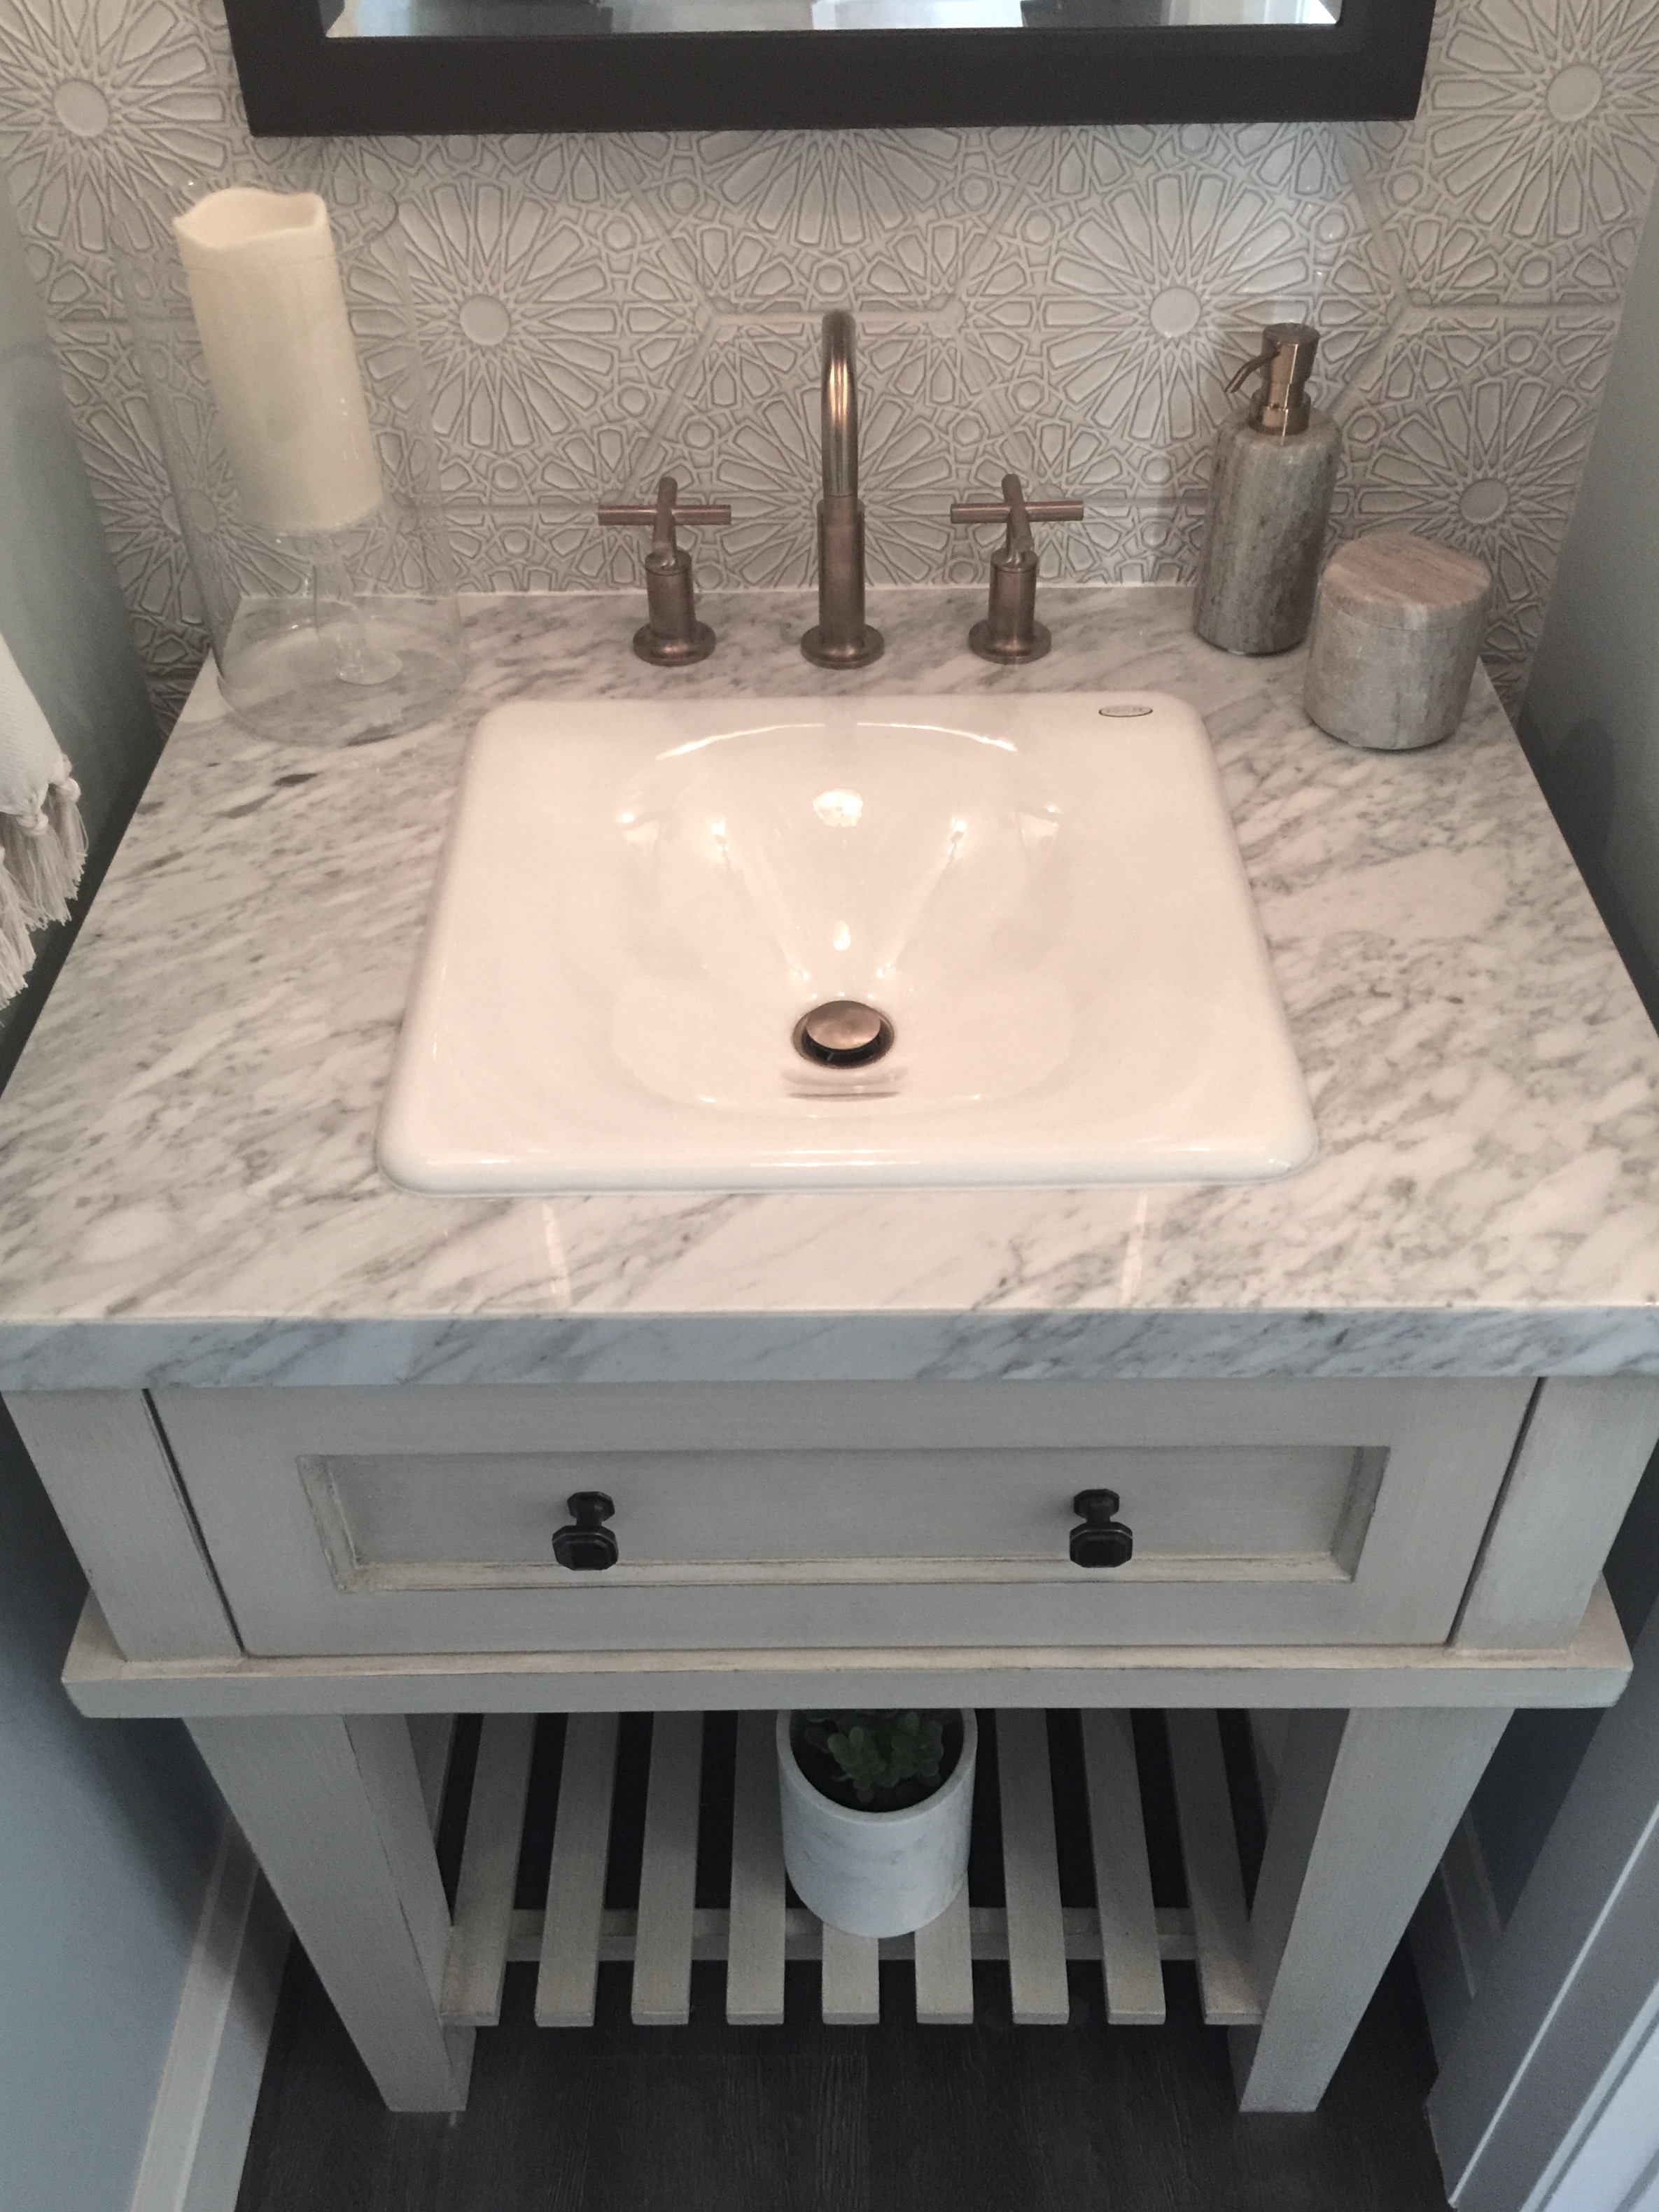 Guest house powder bath vanity - Designer Latrice Gentry-Brooks